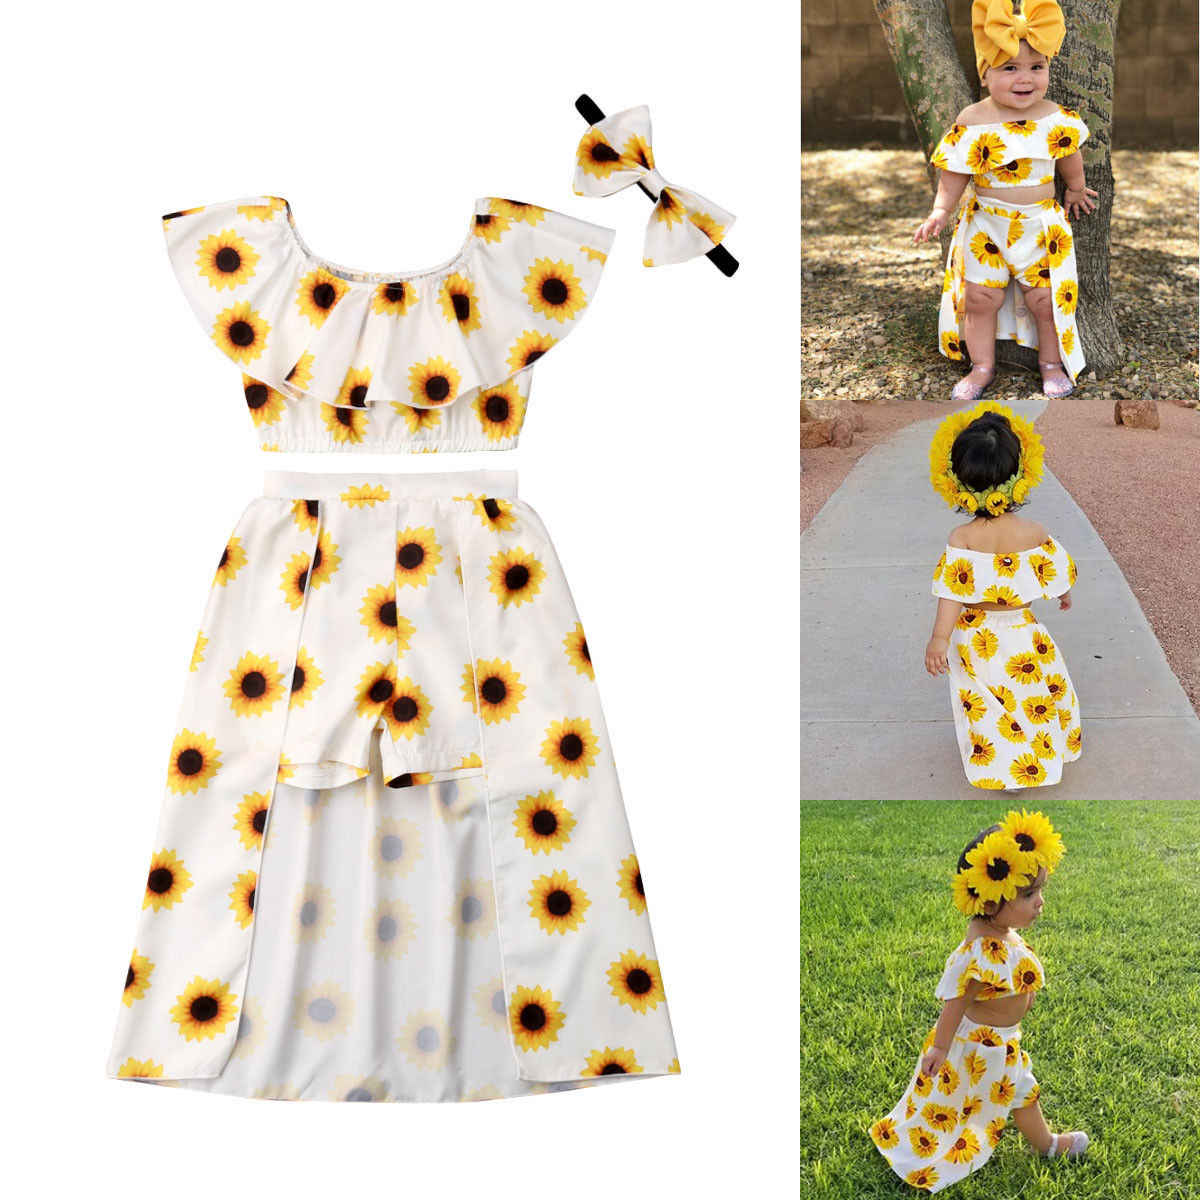 bac5b7b287 Pudcoco Girl Set 2Y-6Y USA Summer Kids Baby Girl Sunflower Crop Tops Shorts  Dress